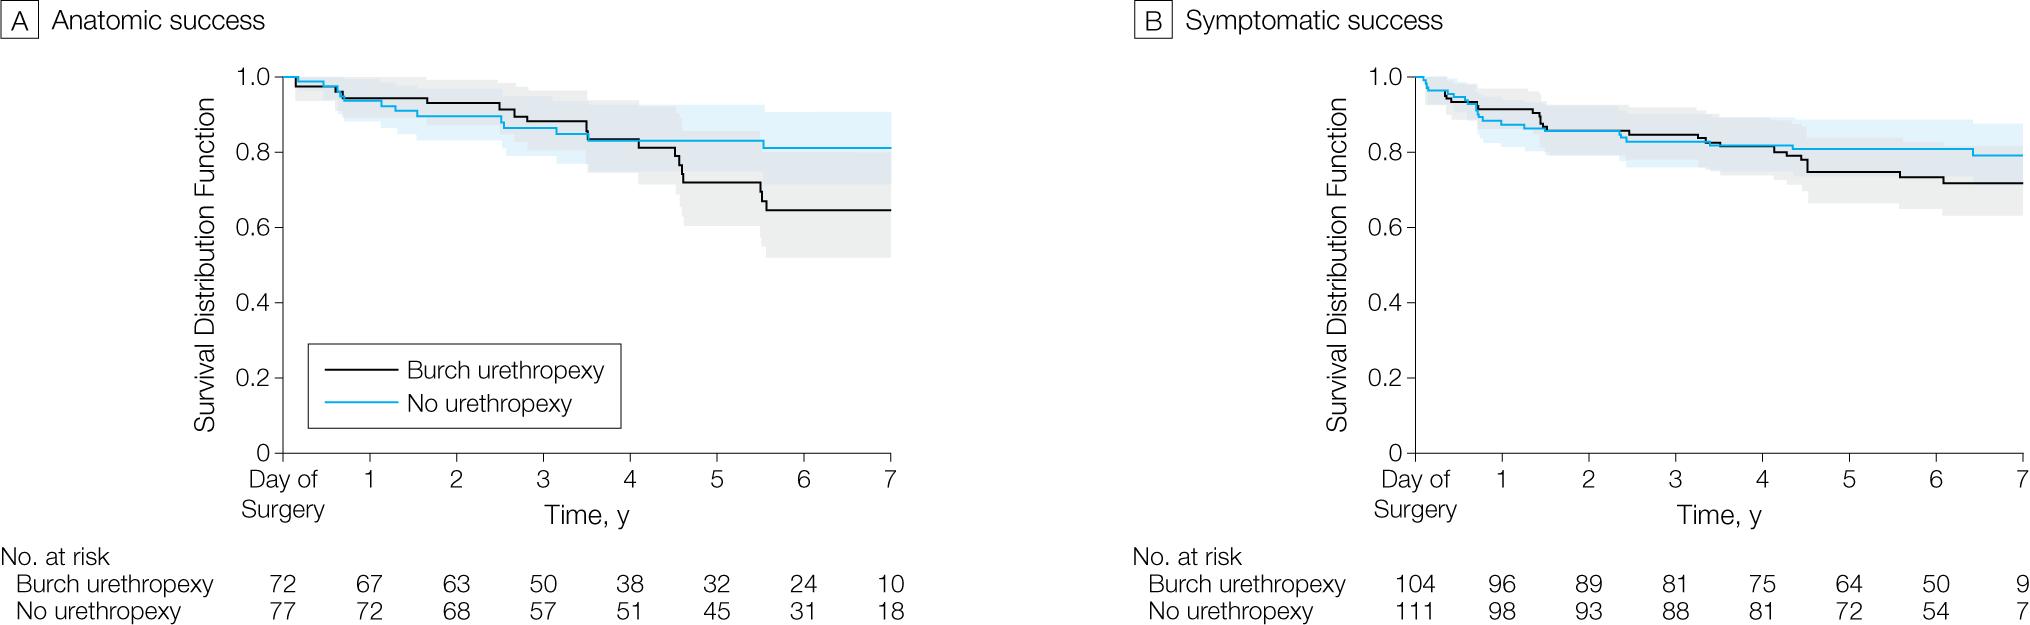 Figure 3. Kaplan-Meier Survival Curves for Success of Abdominal  Sacrocolpopexy in Treating Pelvic